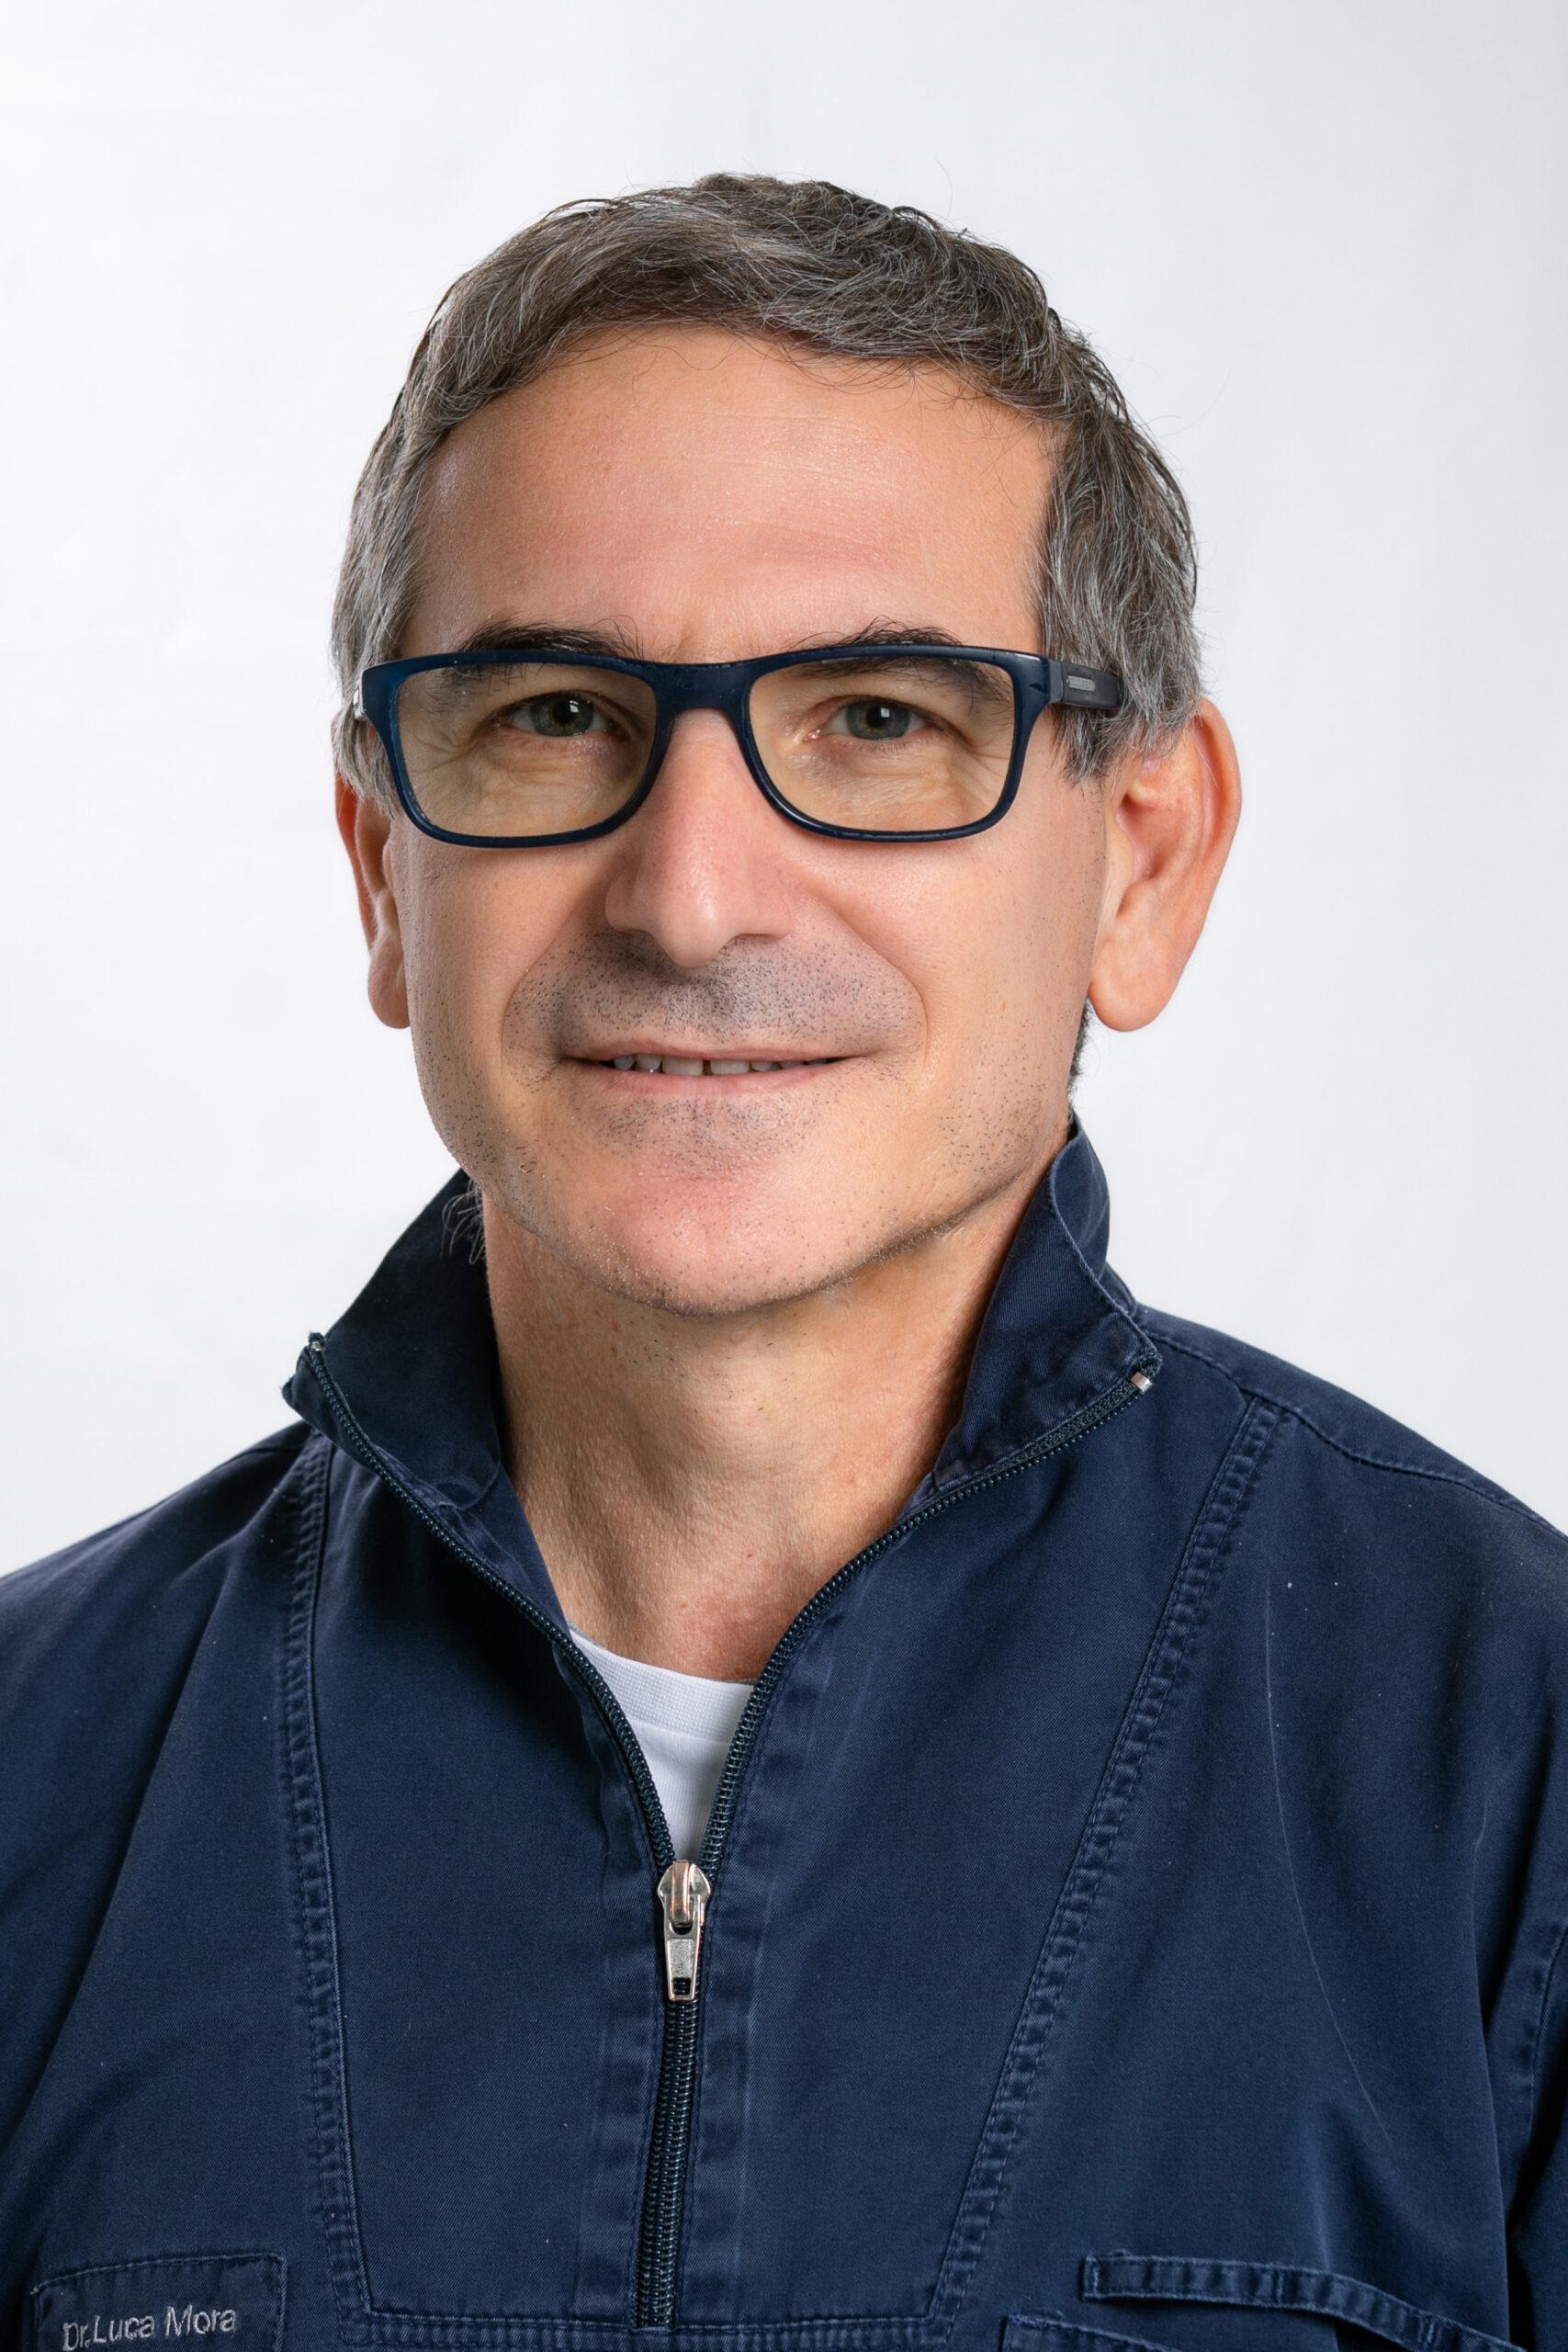 Dott. Luca Mora